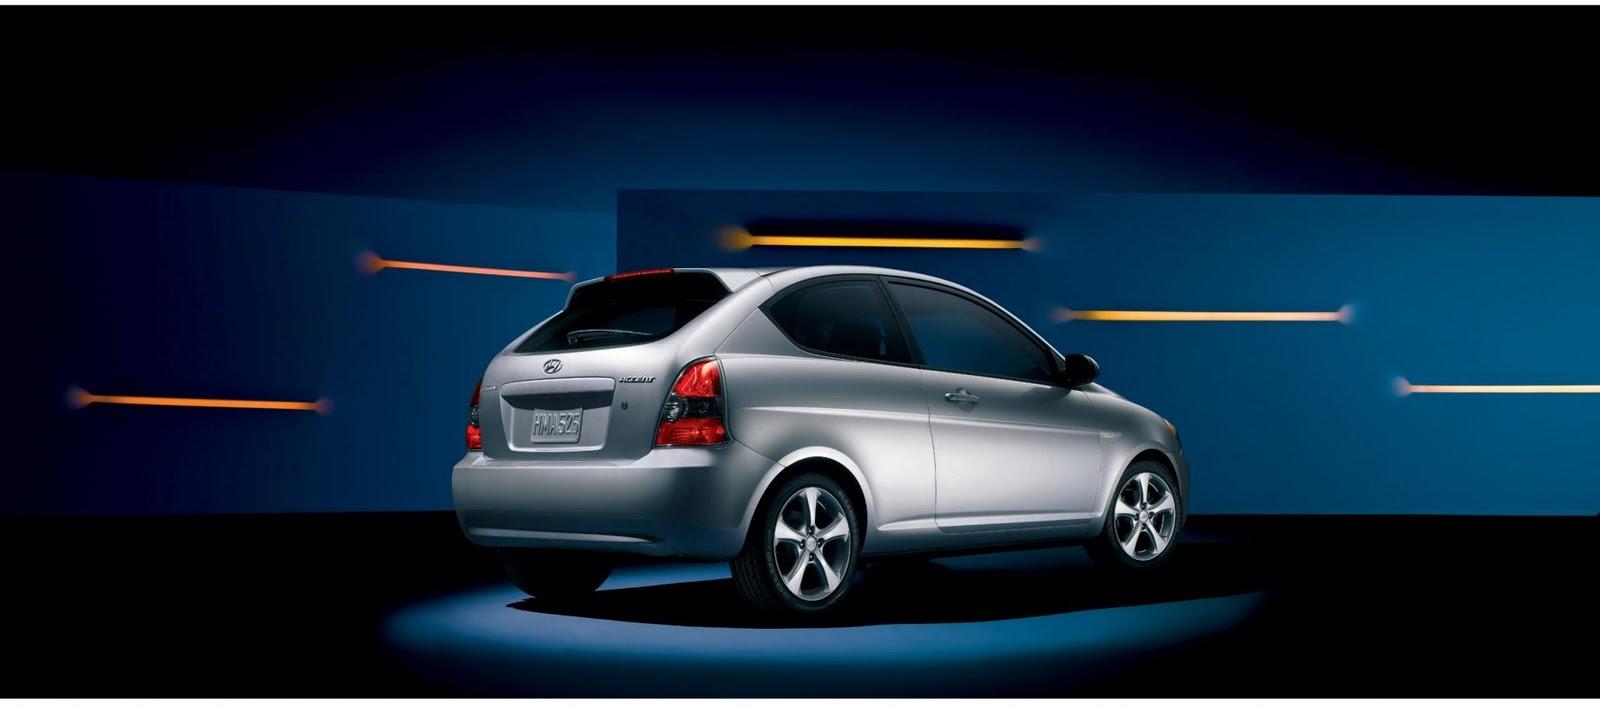 Car Model 2012 Hyundai Accent 2011